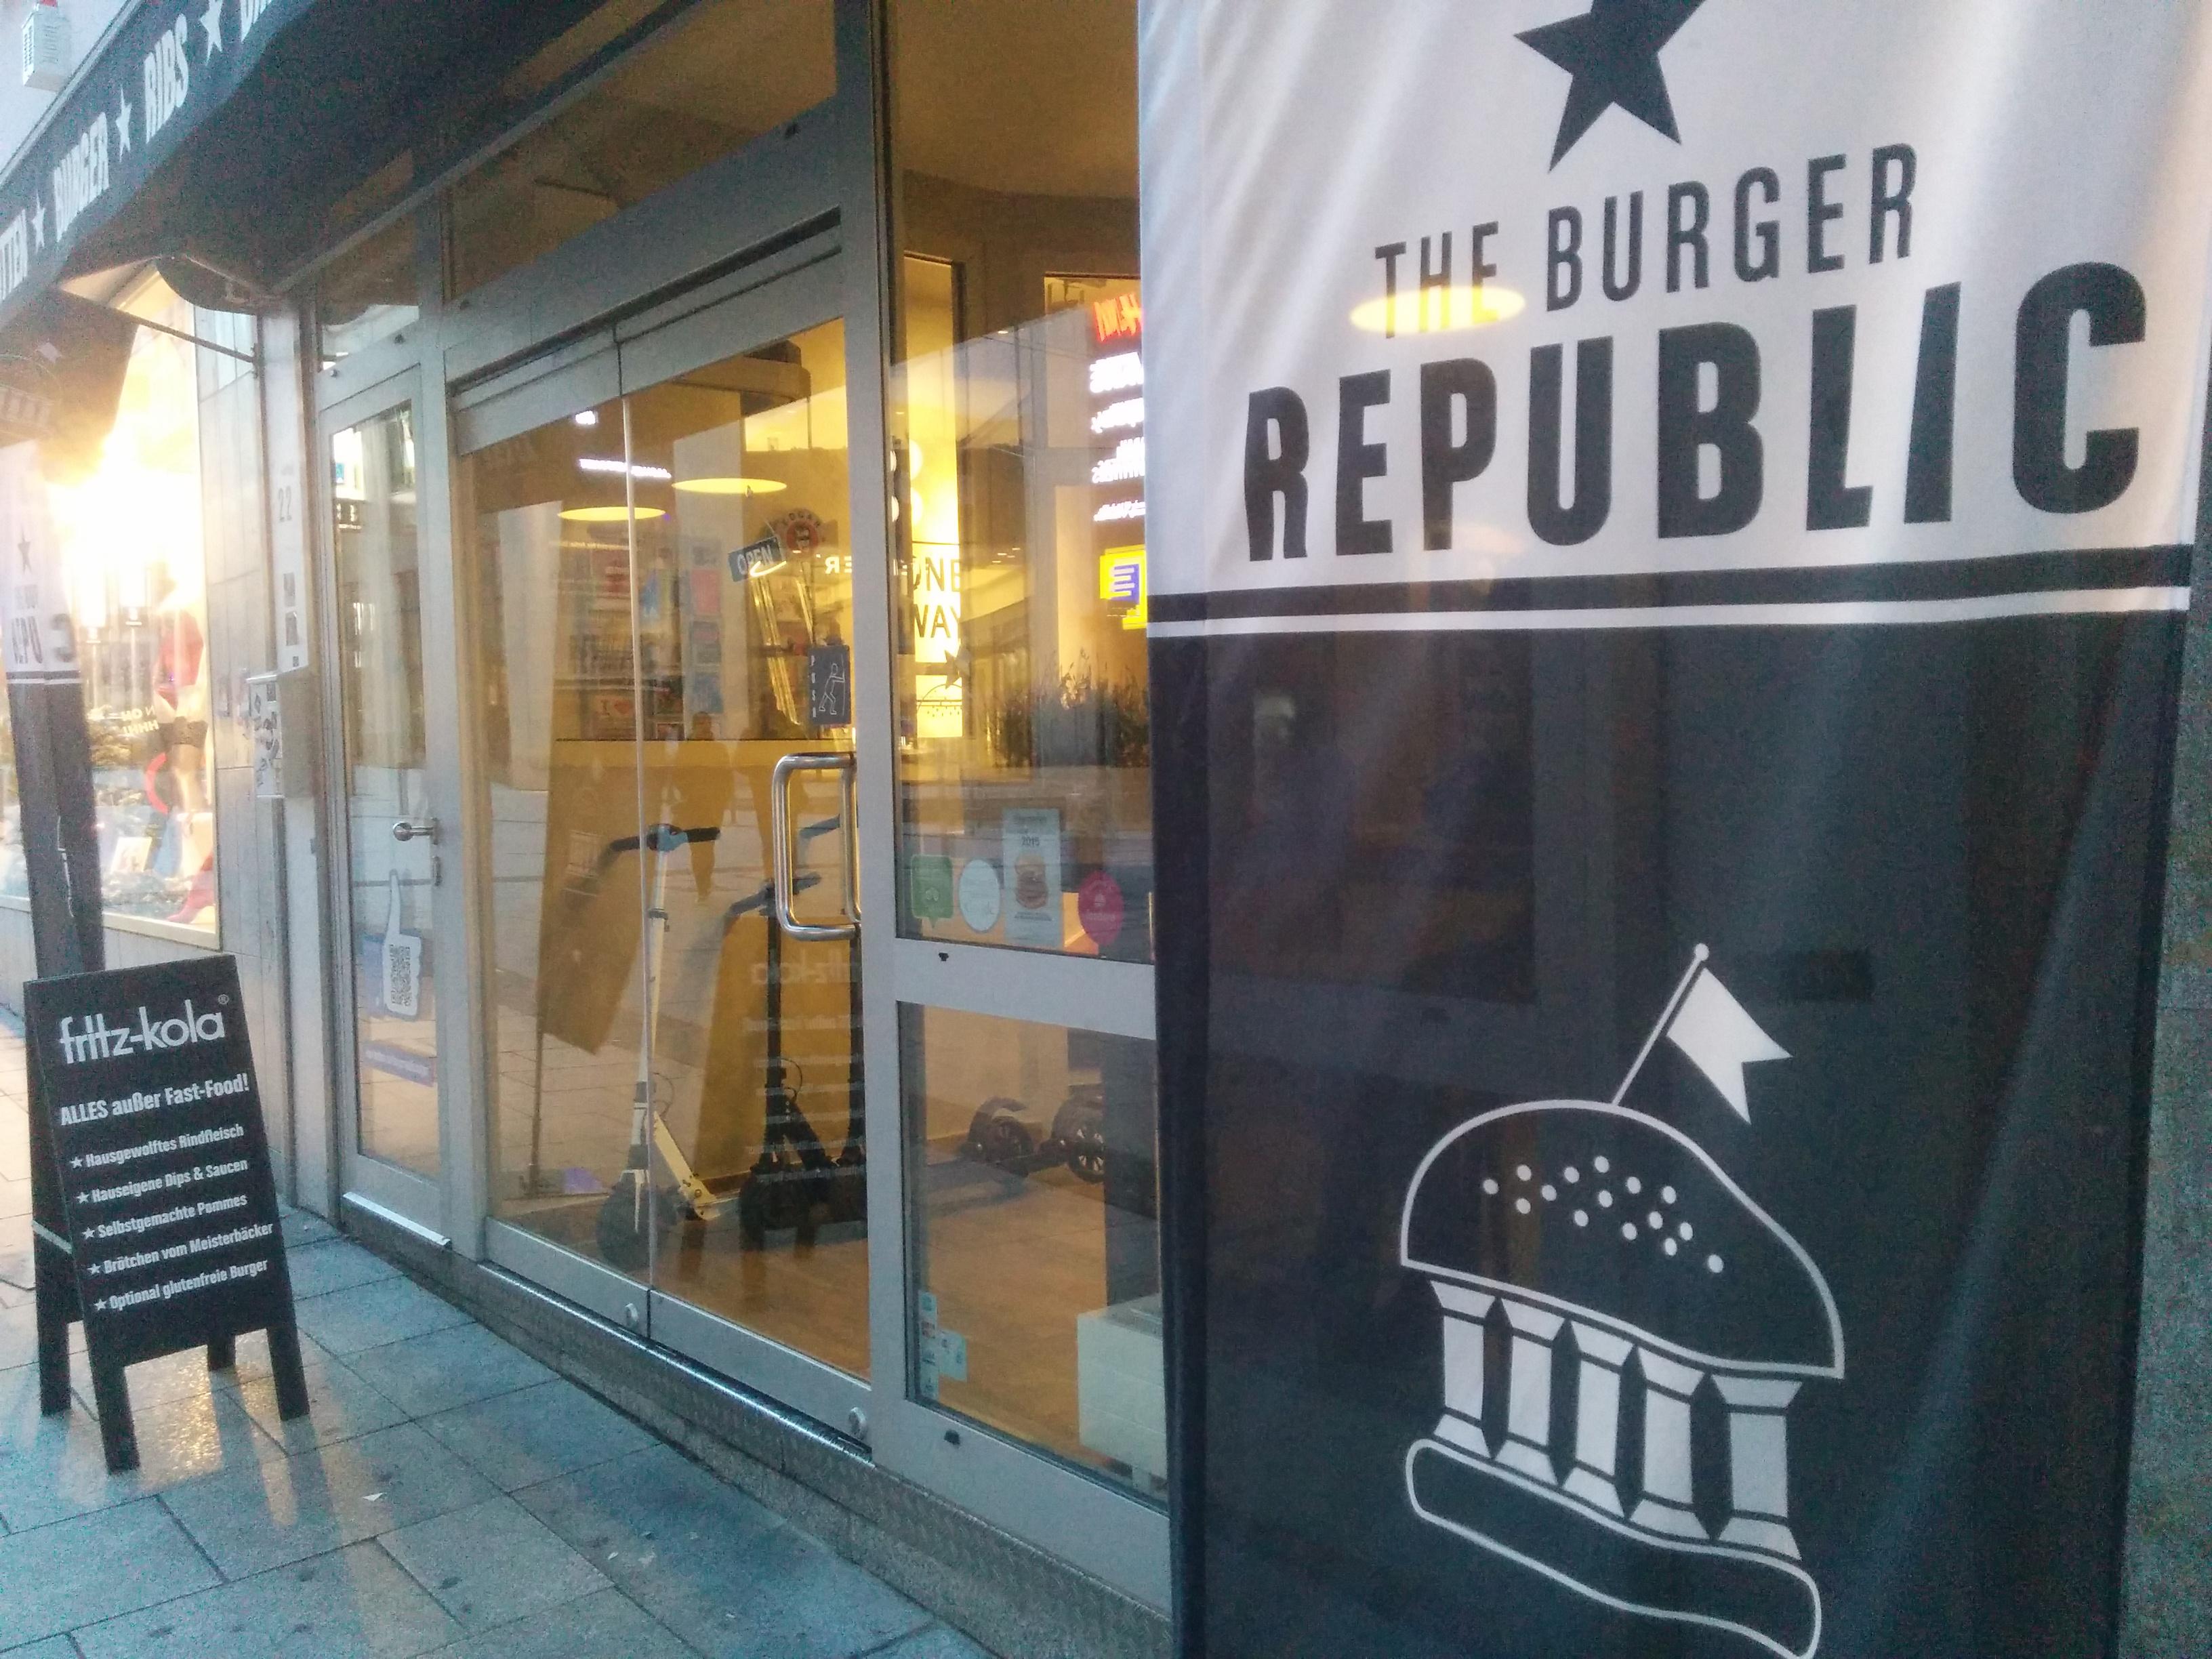 The Burger Republic in Stuttgart, Germany.